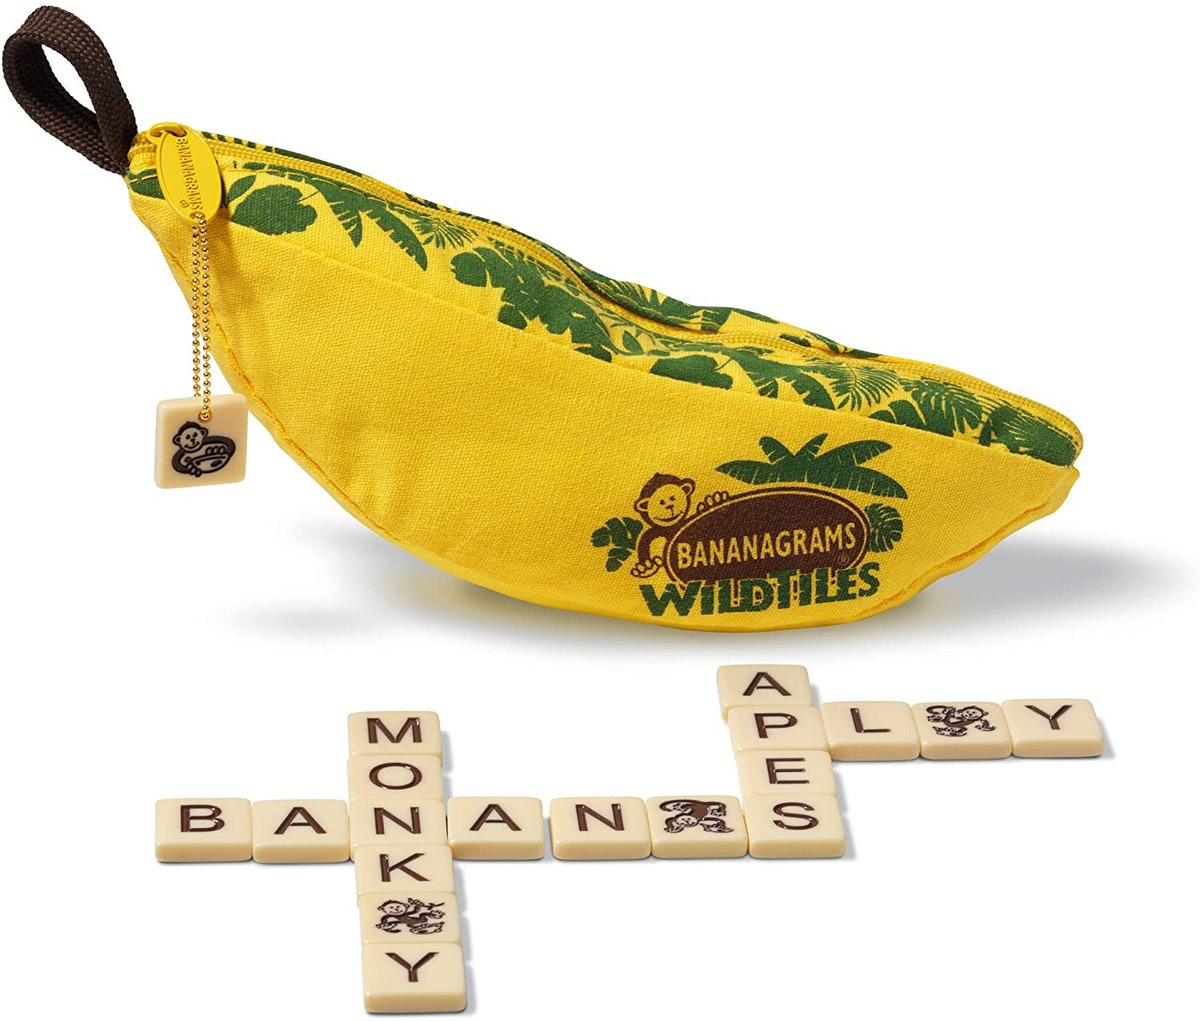 Bananagrams WildTiles